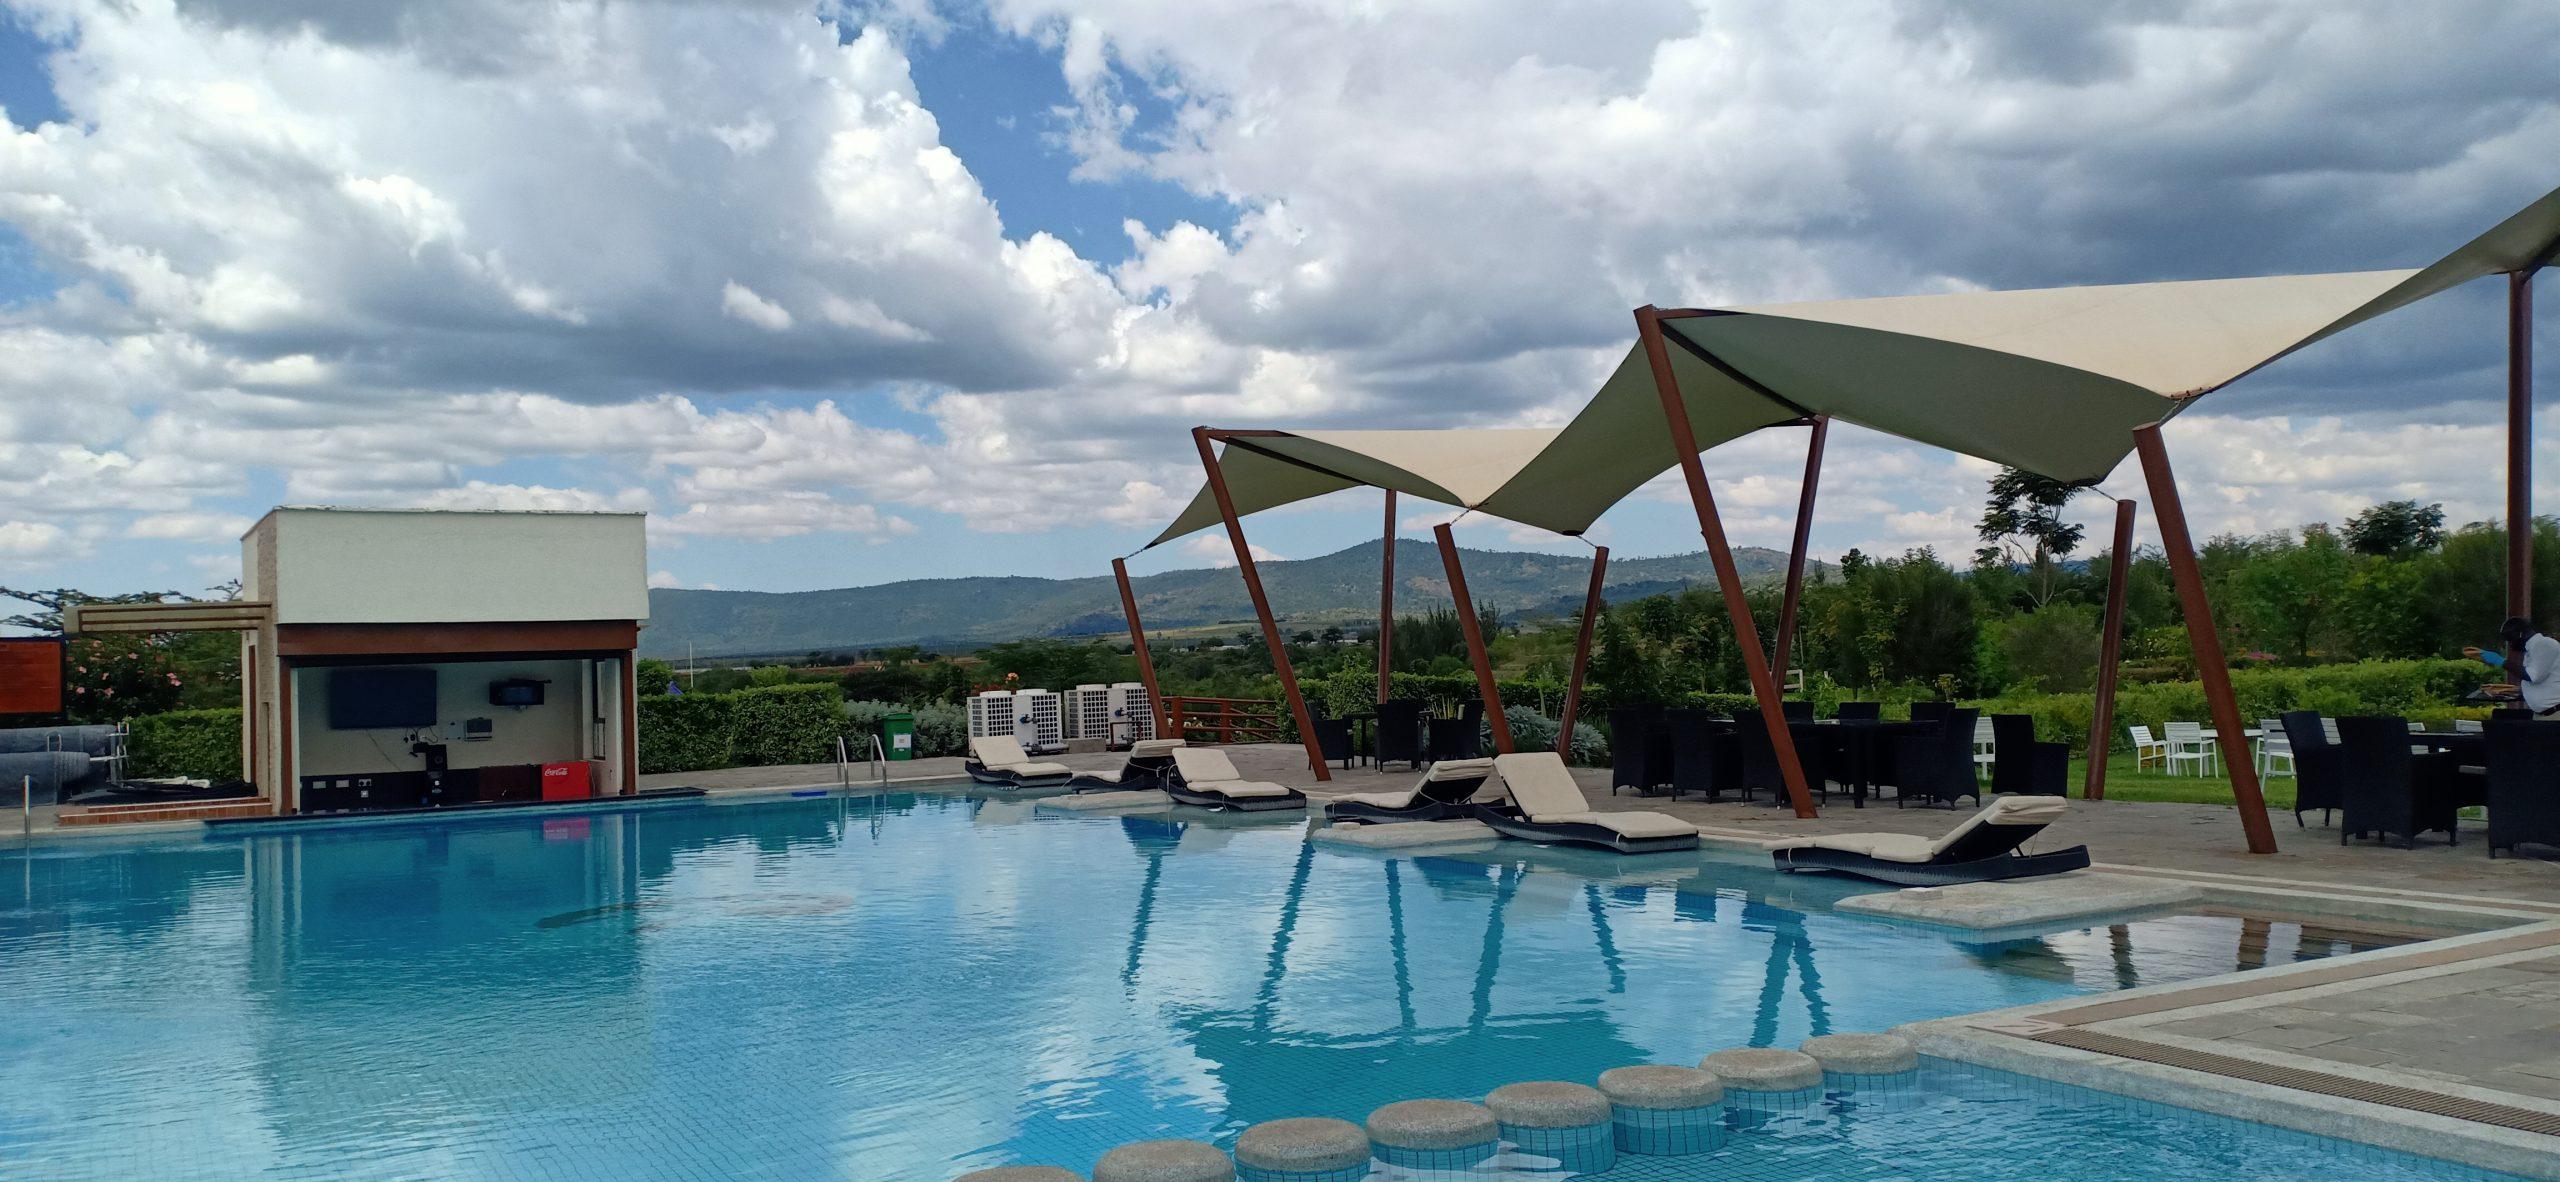 Affordable Luxury Getaways